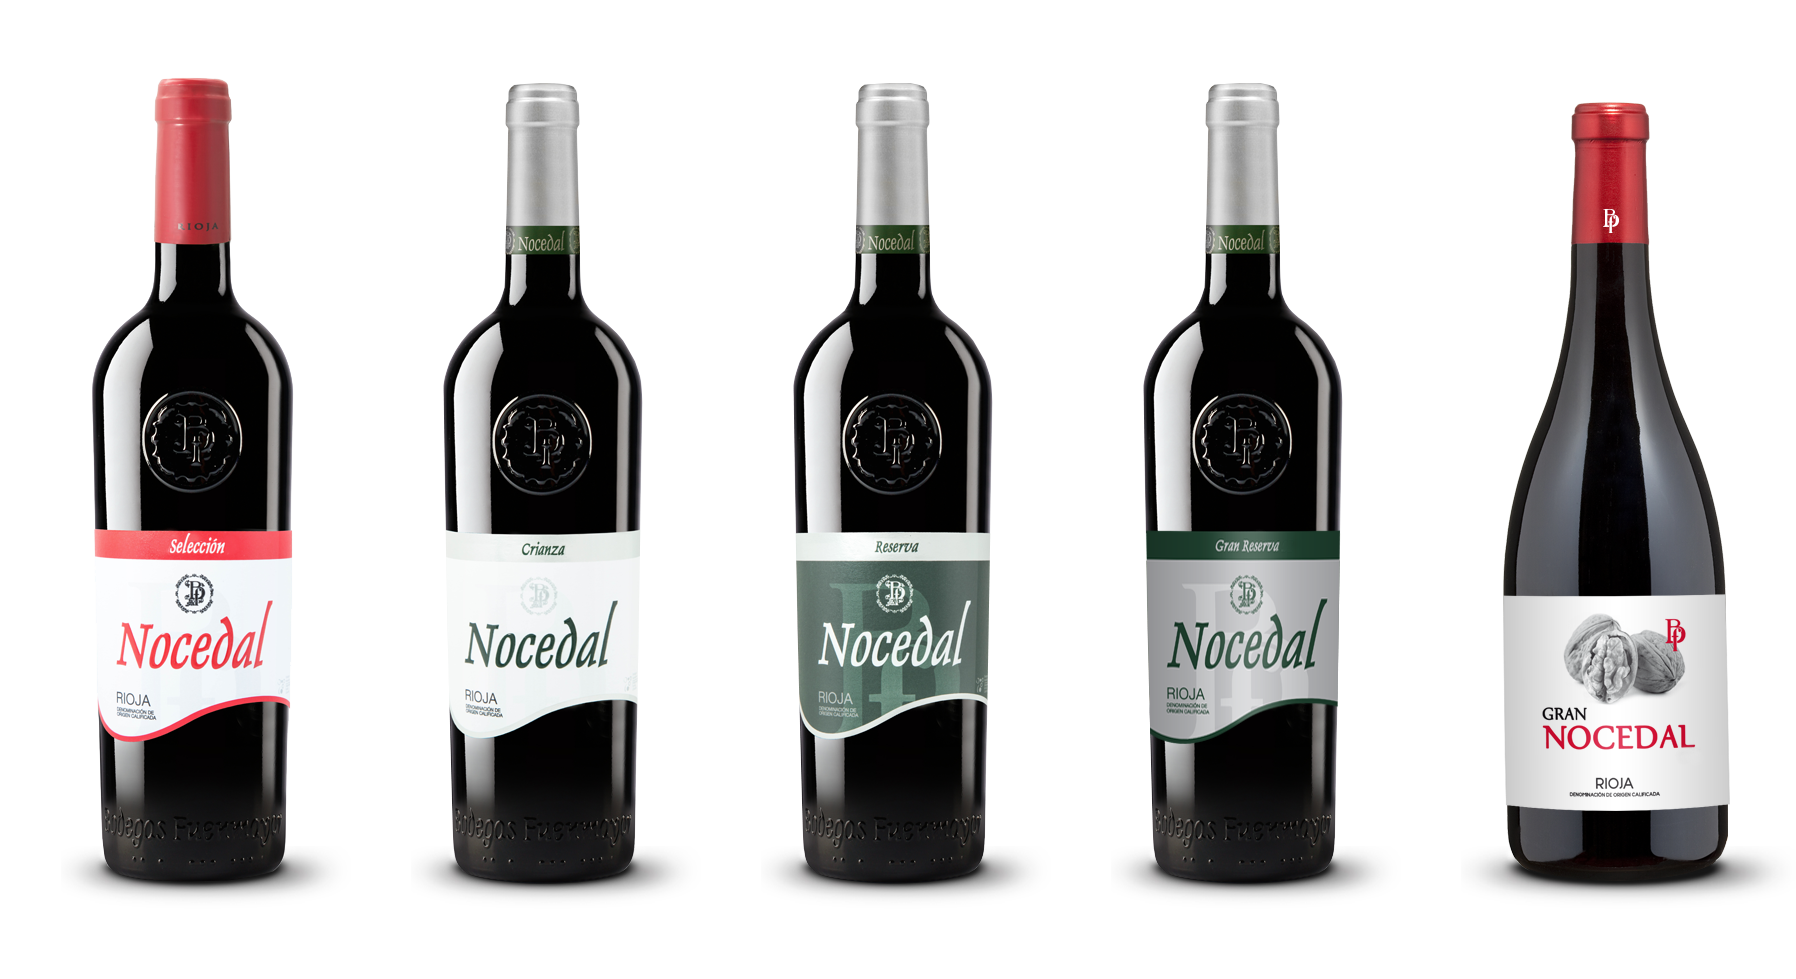 Dise o etiquetas de vino packaging la rioja wicomgroup for Diseno de etiquetas